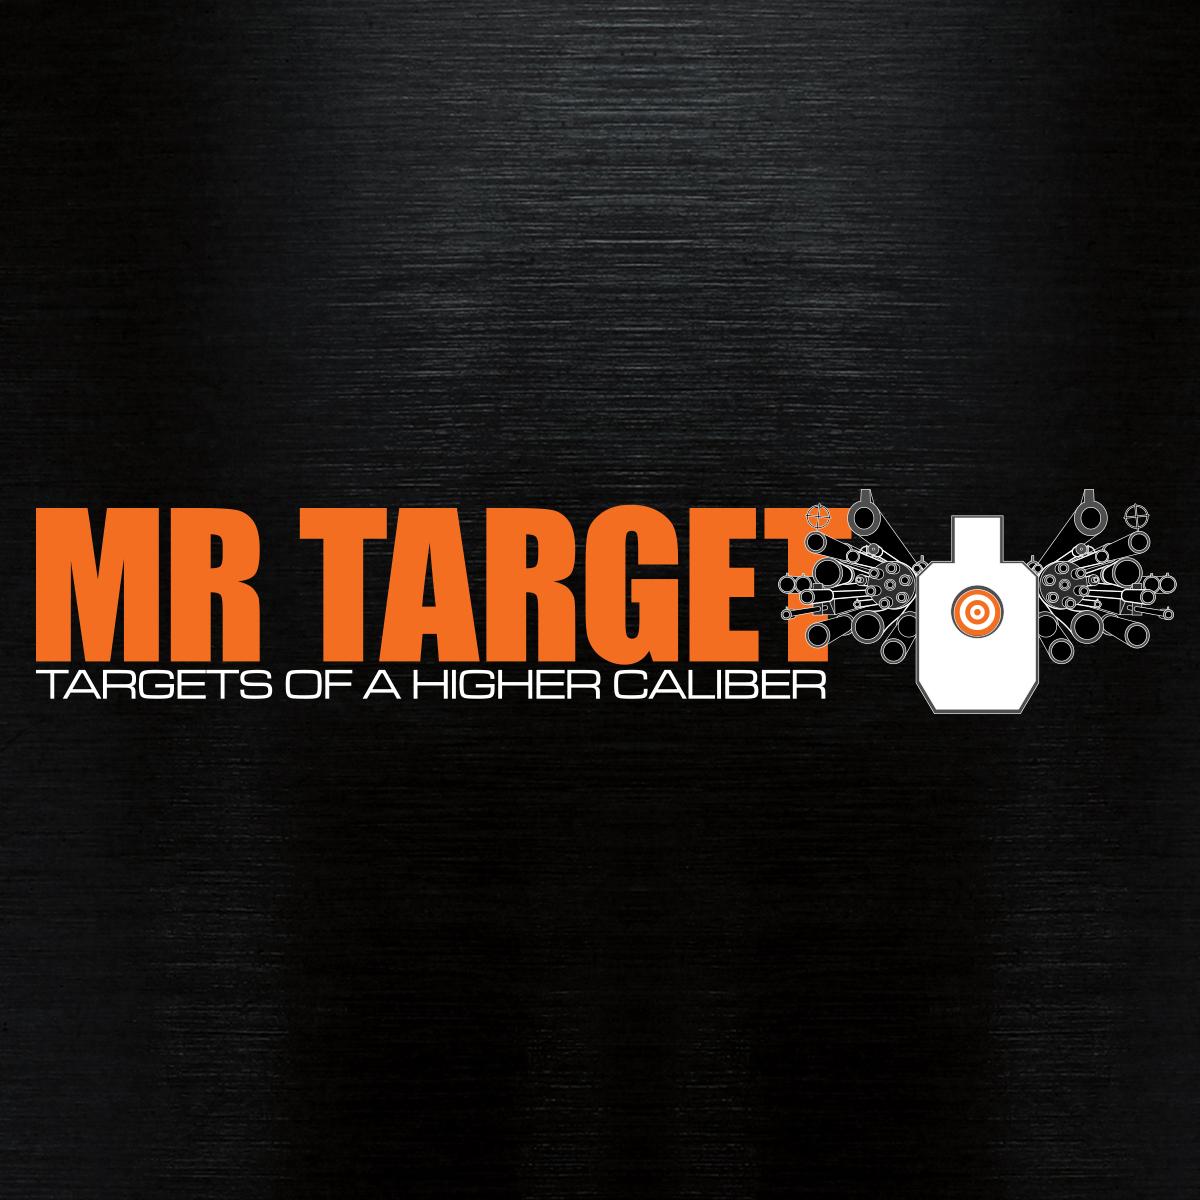 Armored Steel Reactive Shooting Targets